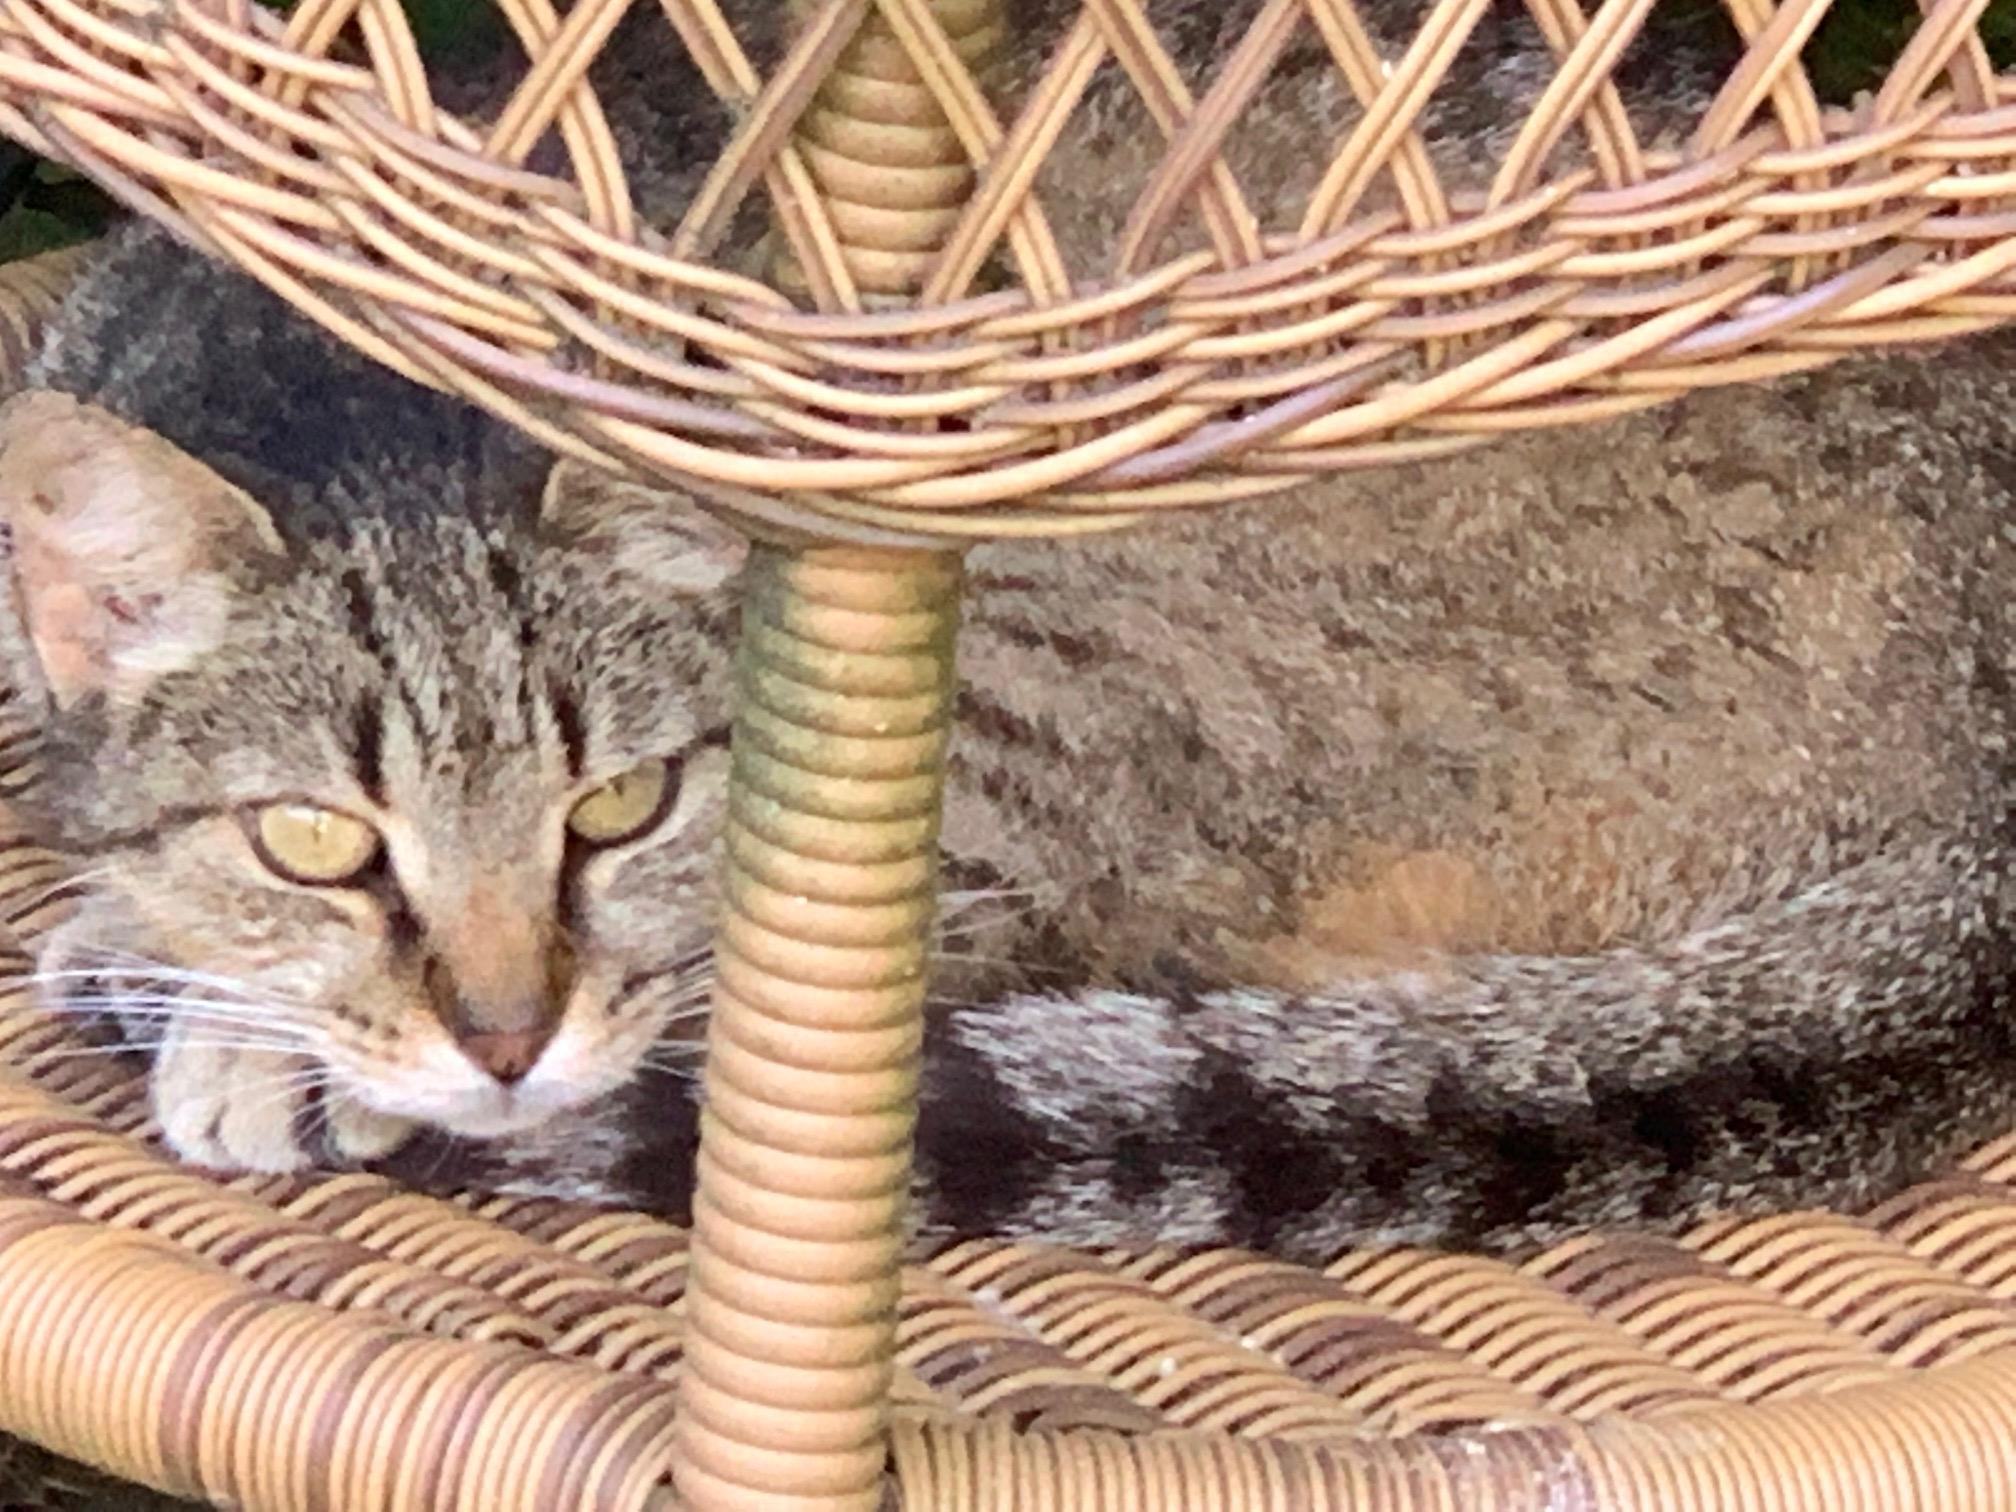 Munchkin enjoying an afternoon nap.